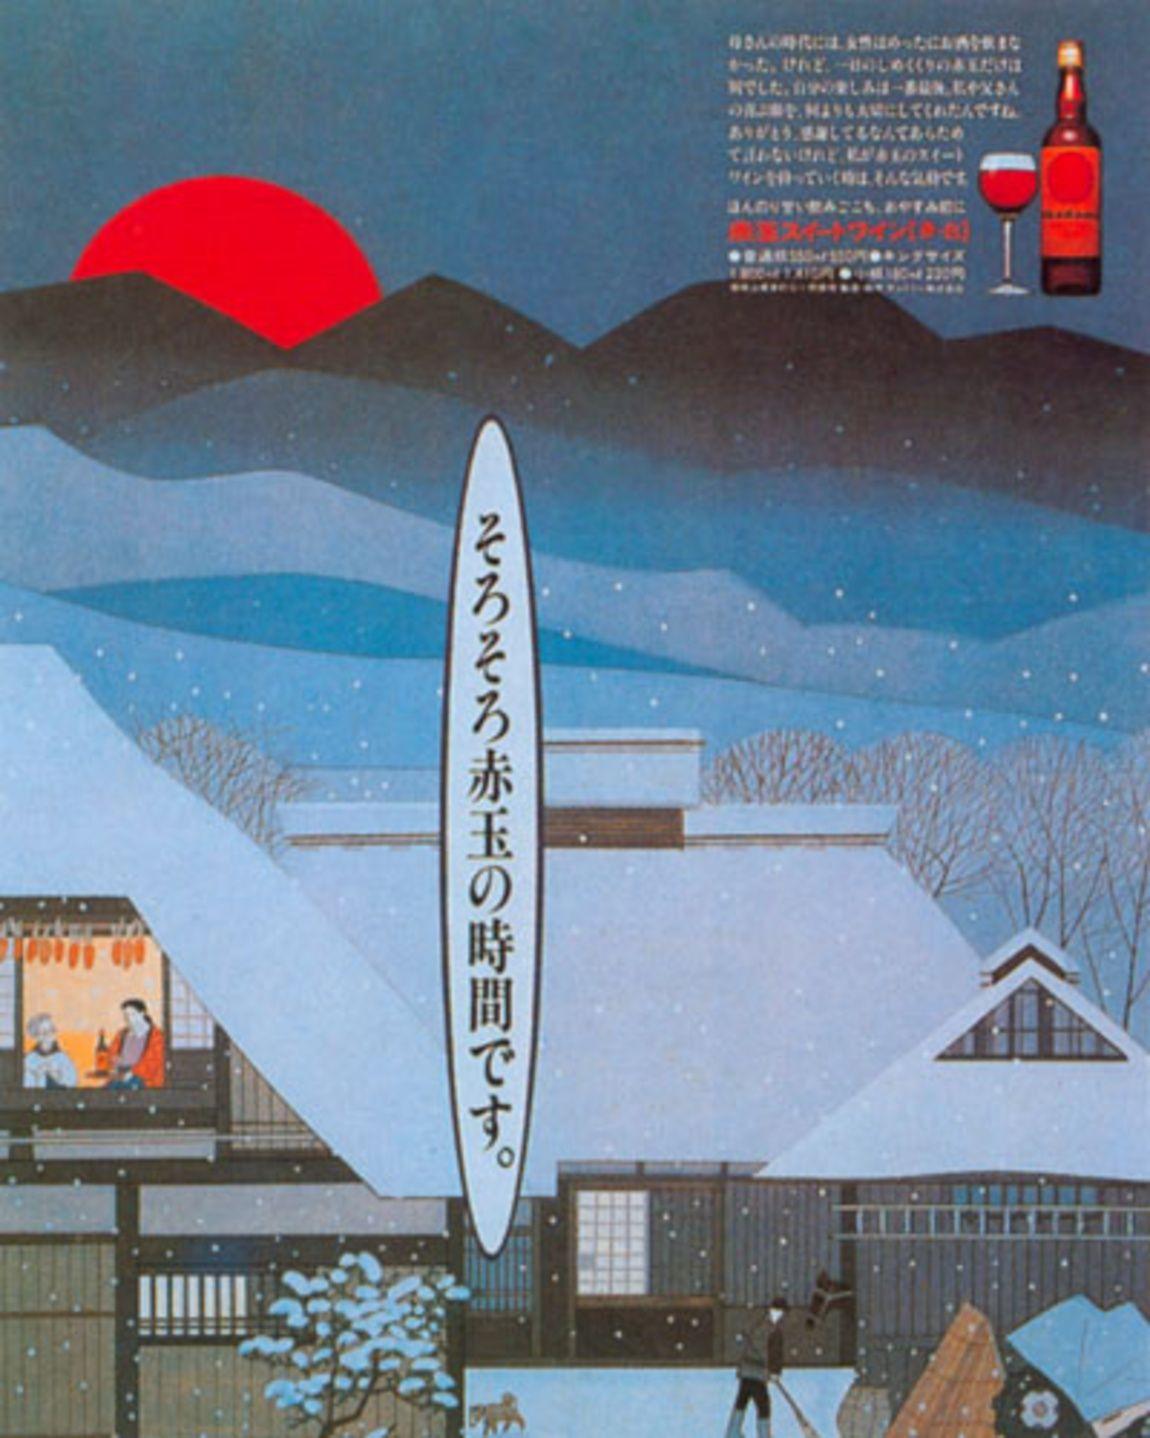 Read more: https://www.luerzersarchive.com/en/magazine/print-detail/14022.html Campaign for Japanese red wine. Tags: Kiyoshi Omoti,Takeshi Yorieshima,Yasihiro Yomogida,Akadama,Hakuhodo, Tokyo